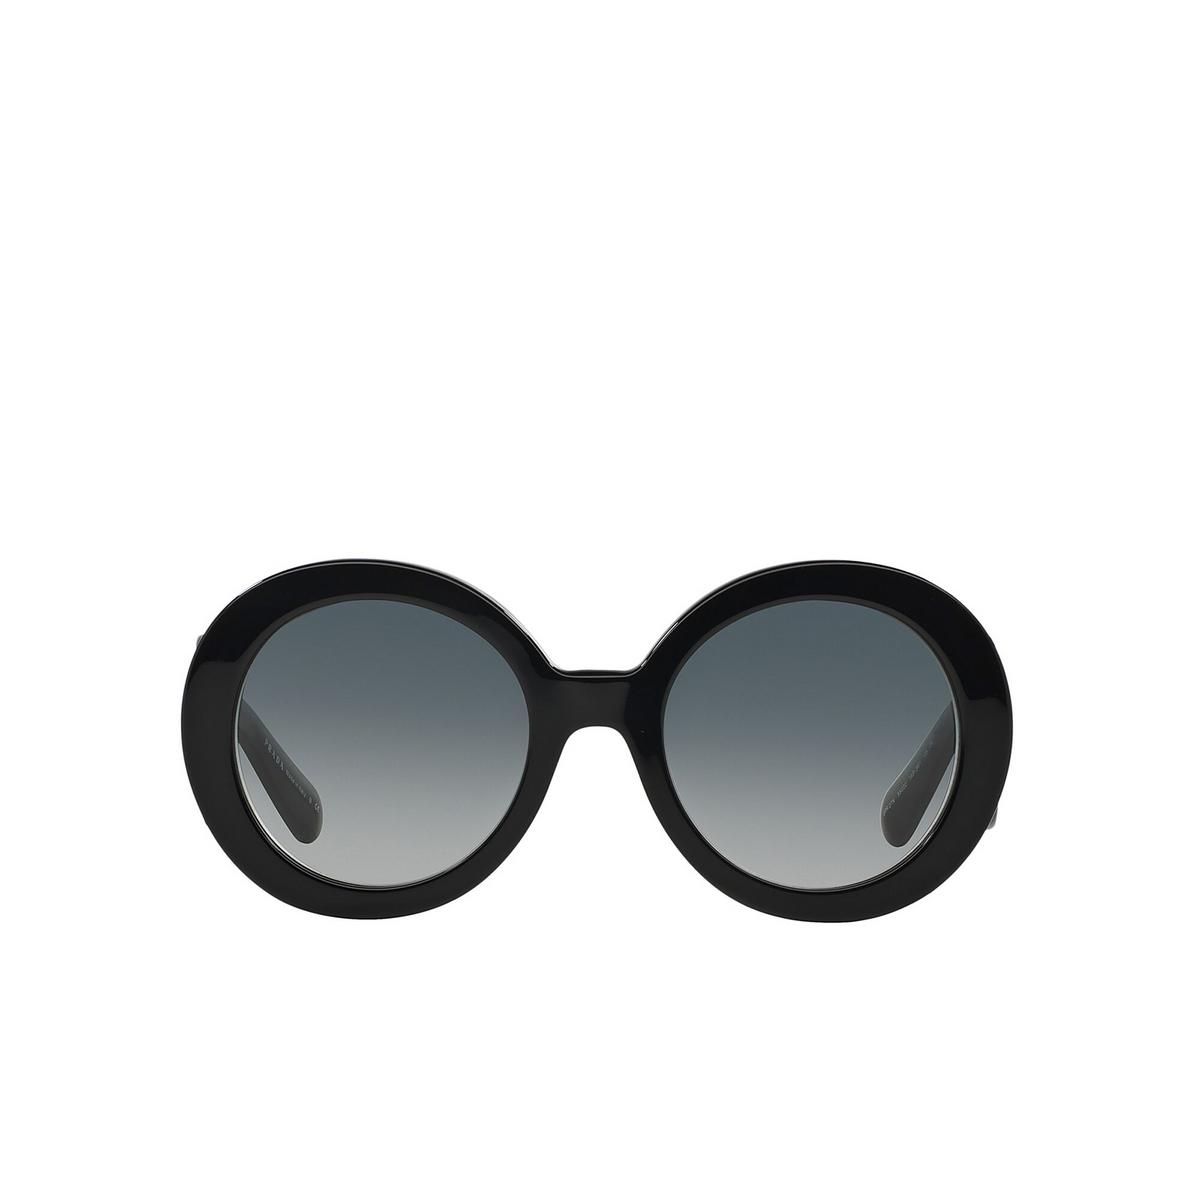 Prada® Round Sunglasses: Catwalk PR 27NS color Black 1AB3M1 - front view.